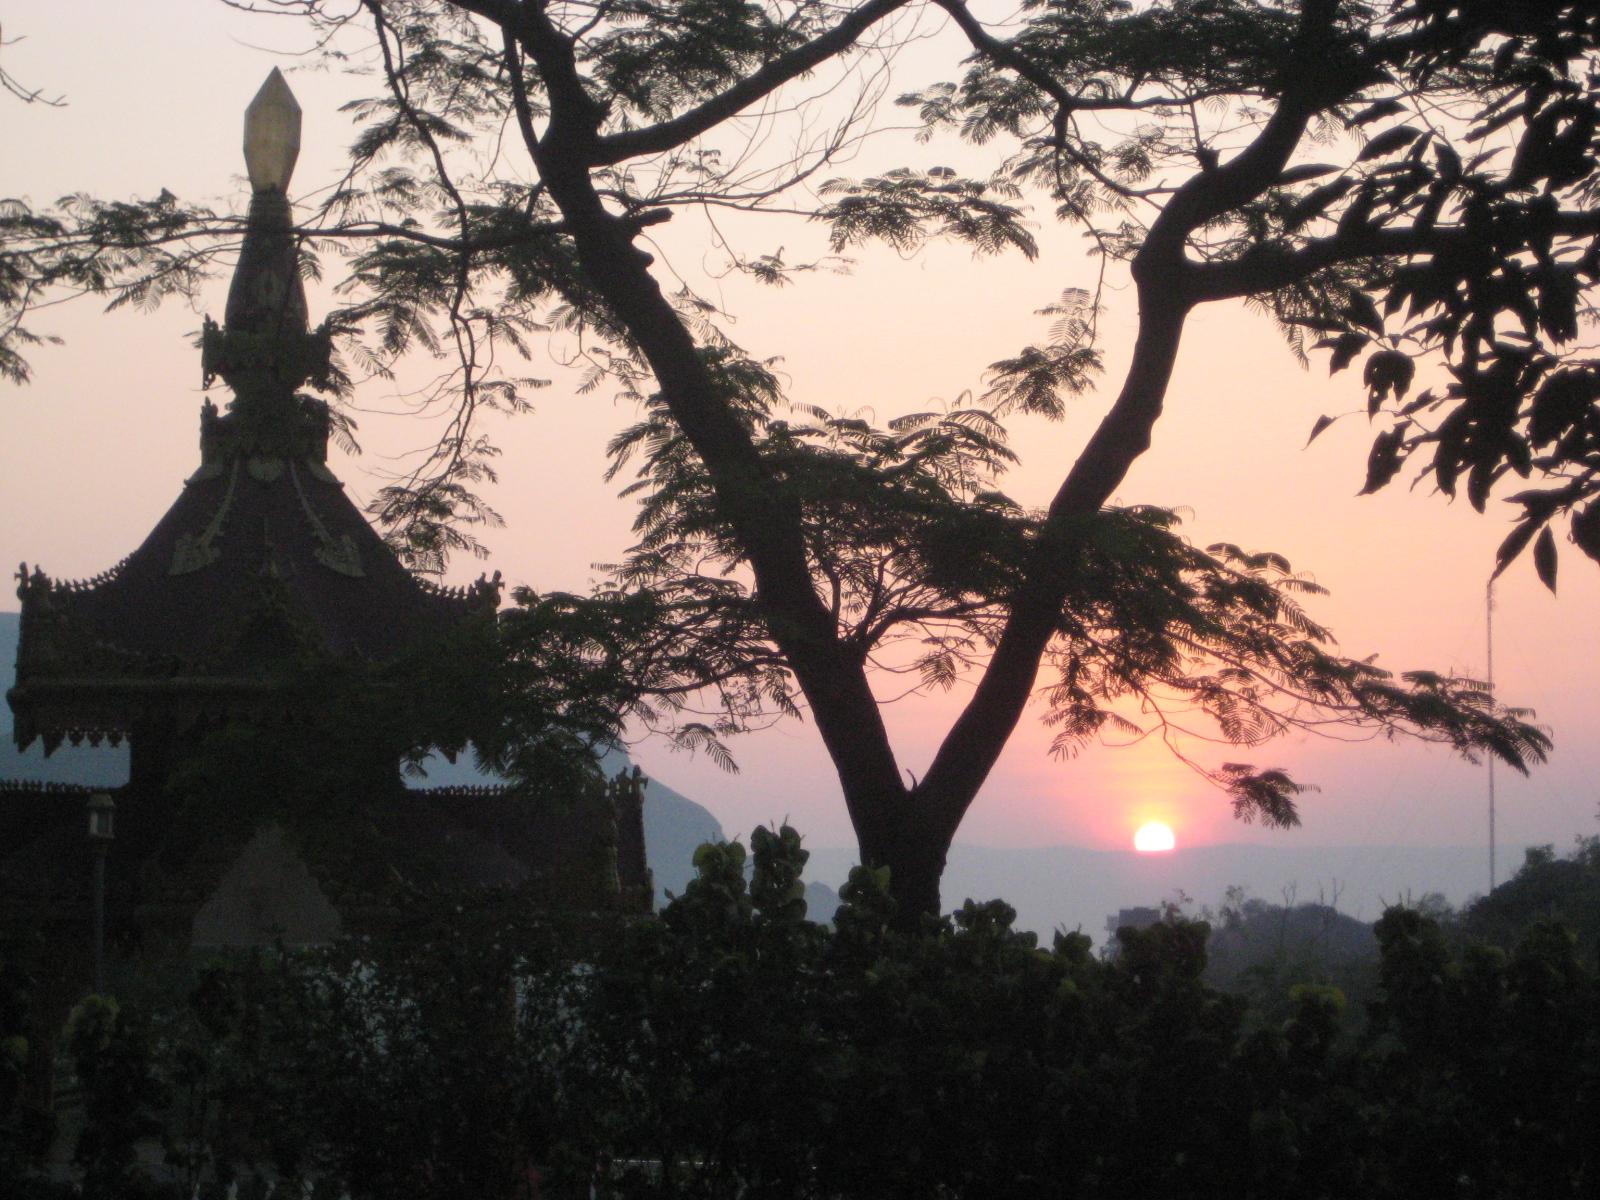 Sunrise at Igatpuri